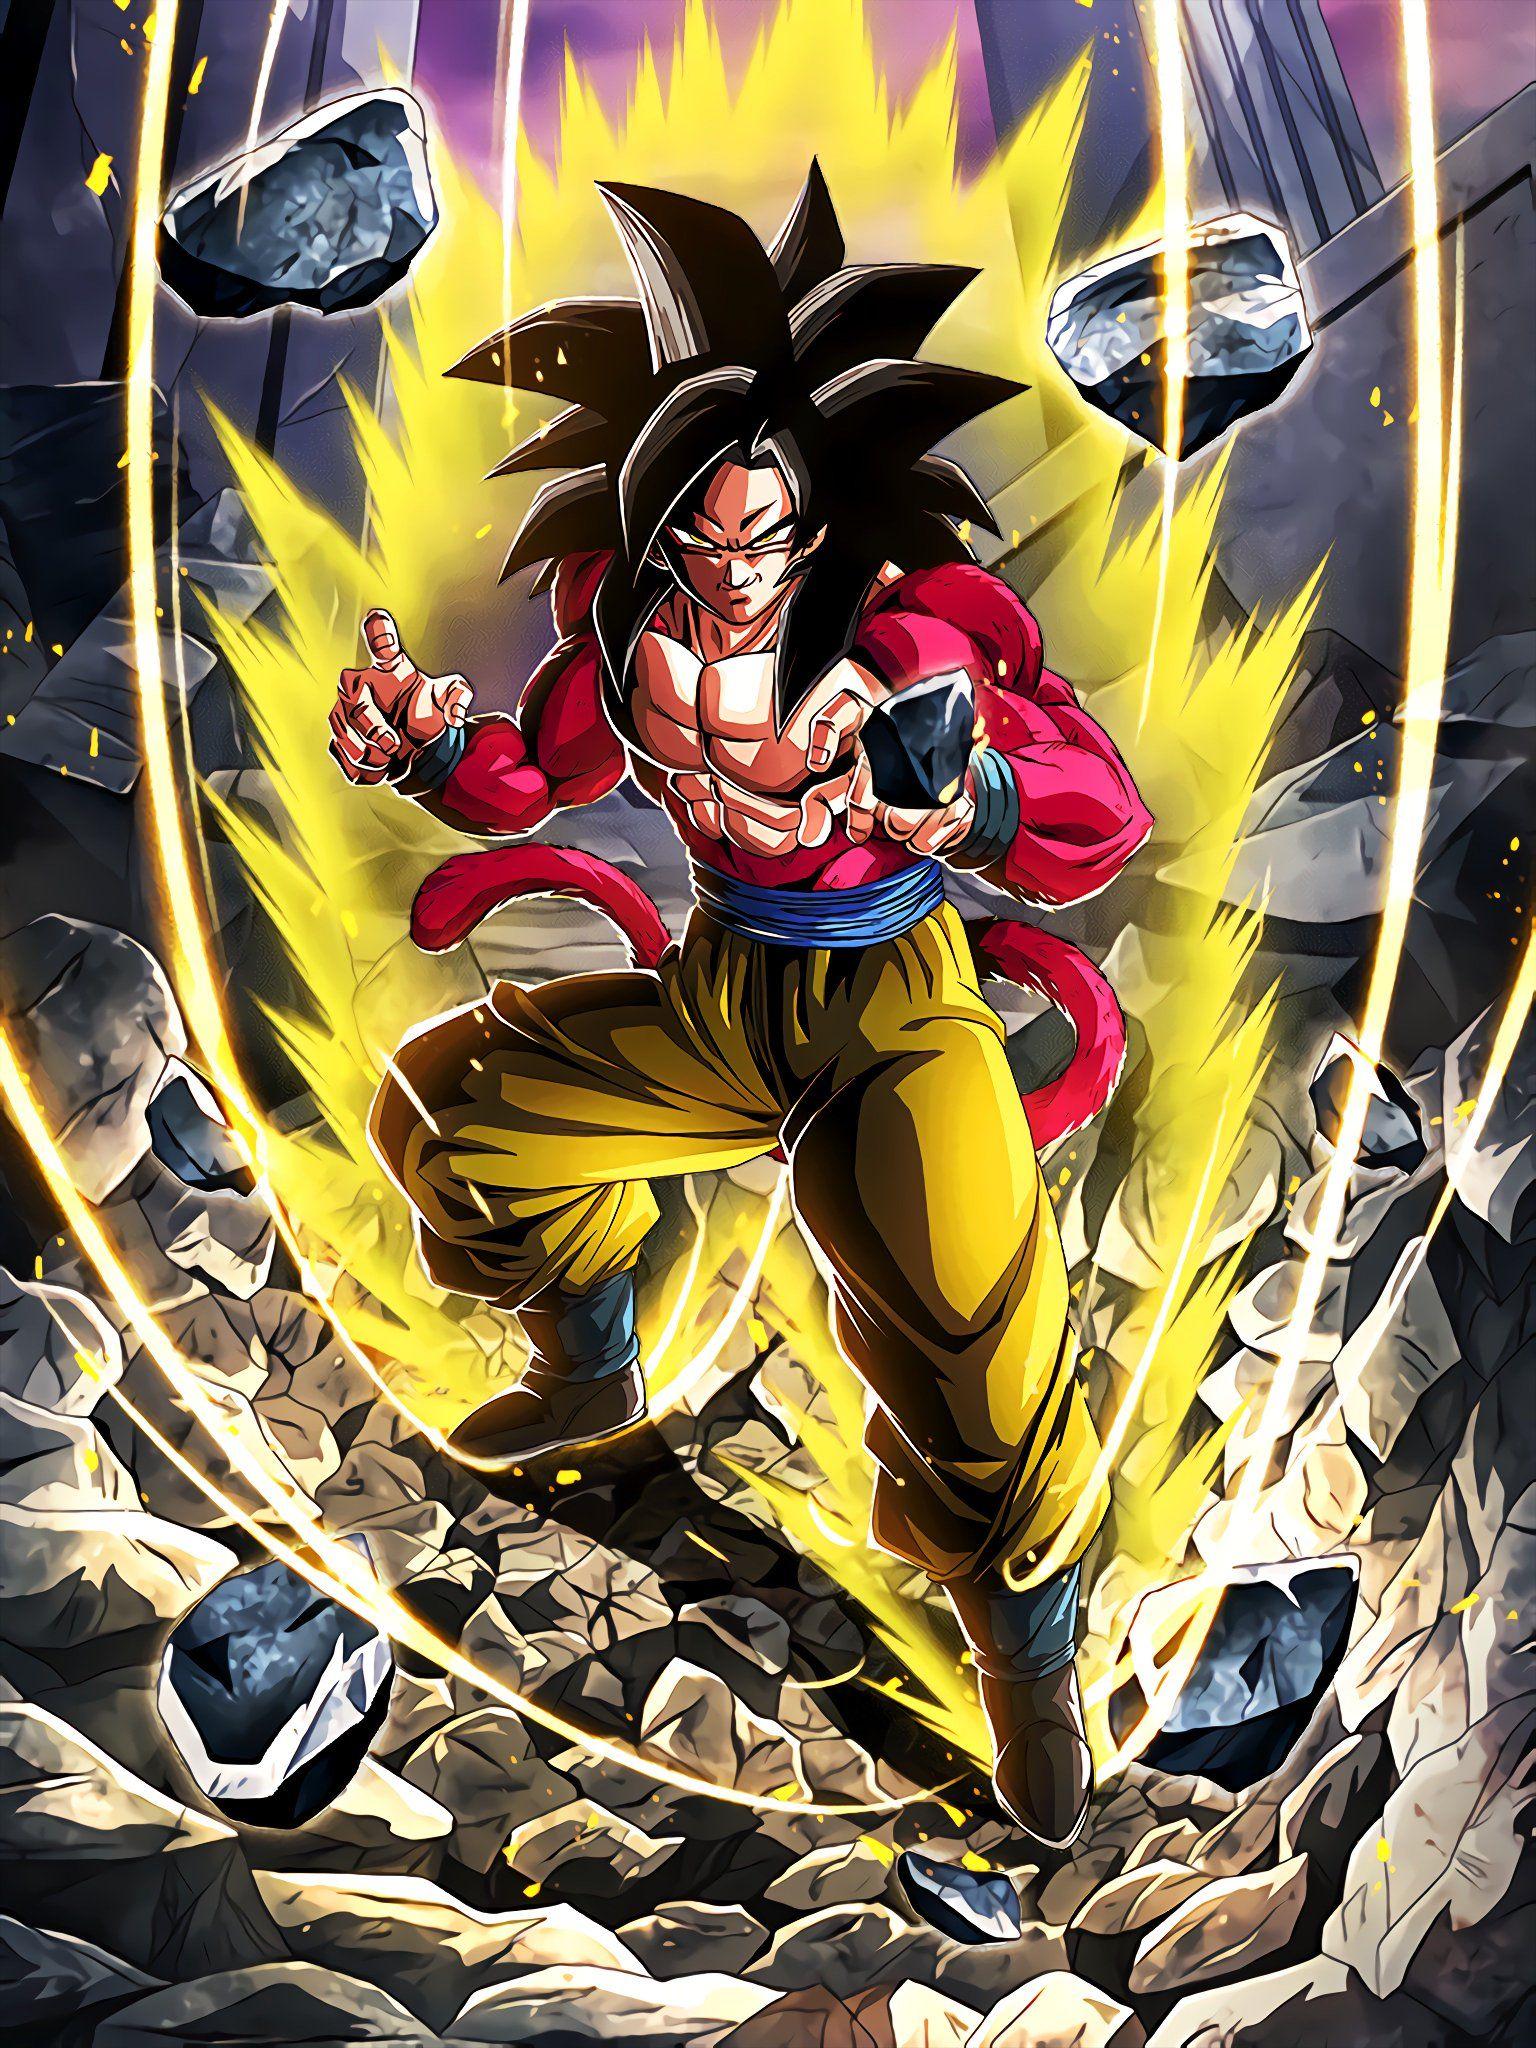 Hydros On Twitter Dragon Ball Goku Anime Dragon Ball Super Dragon Ball Super Manga